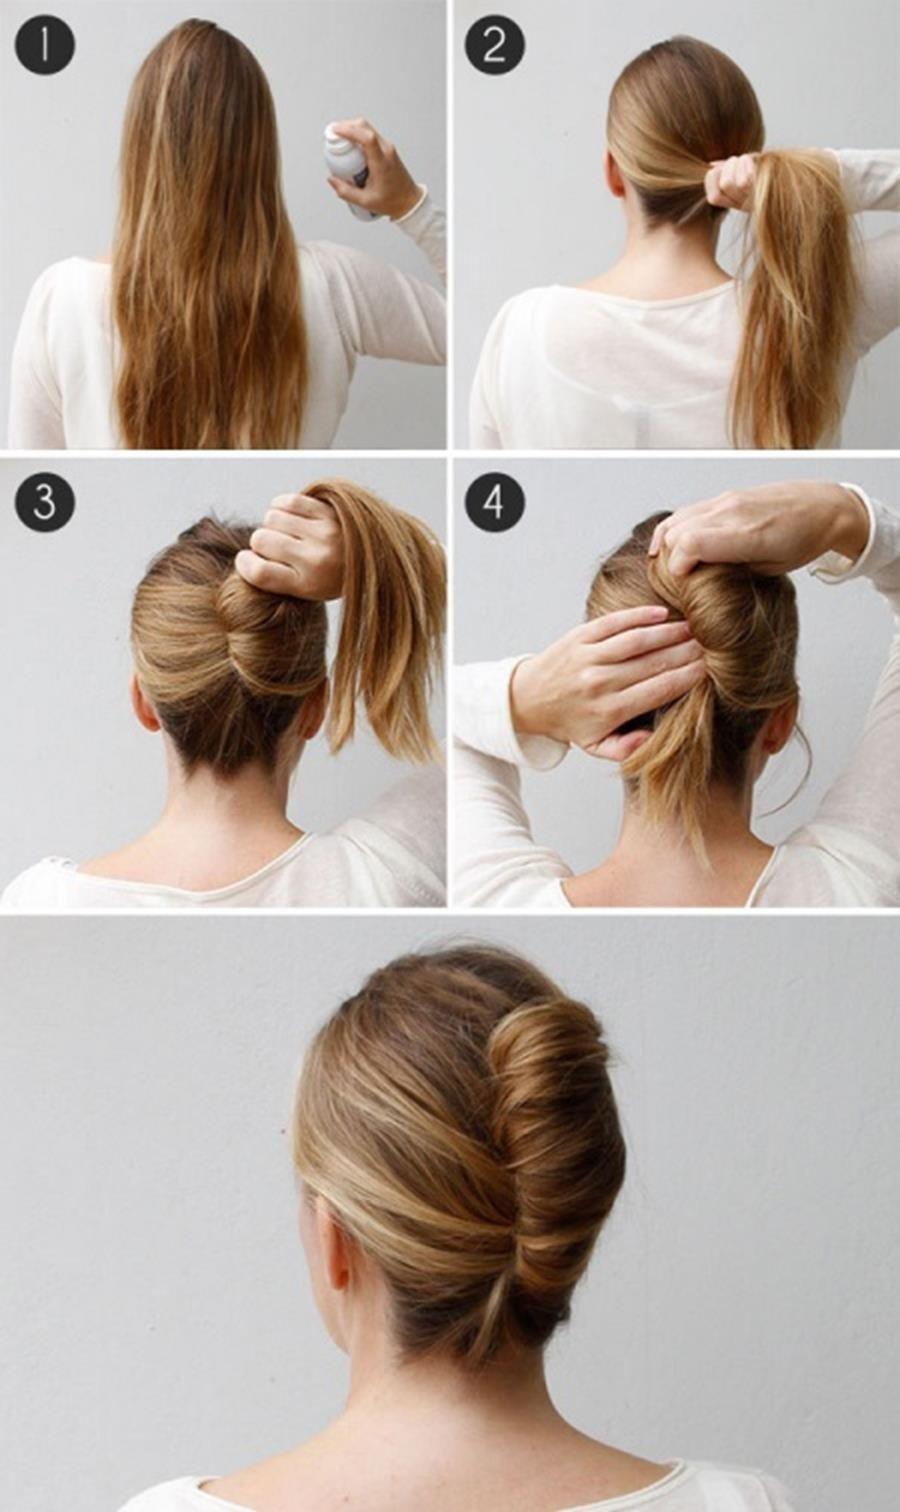 Die 14 Besten Frisuren Hacks Bei Langen Haaren Und Wenig Zeit